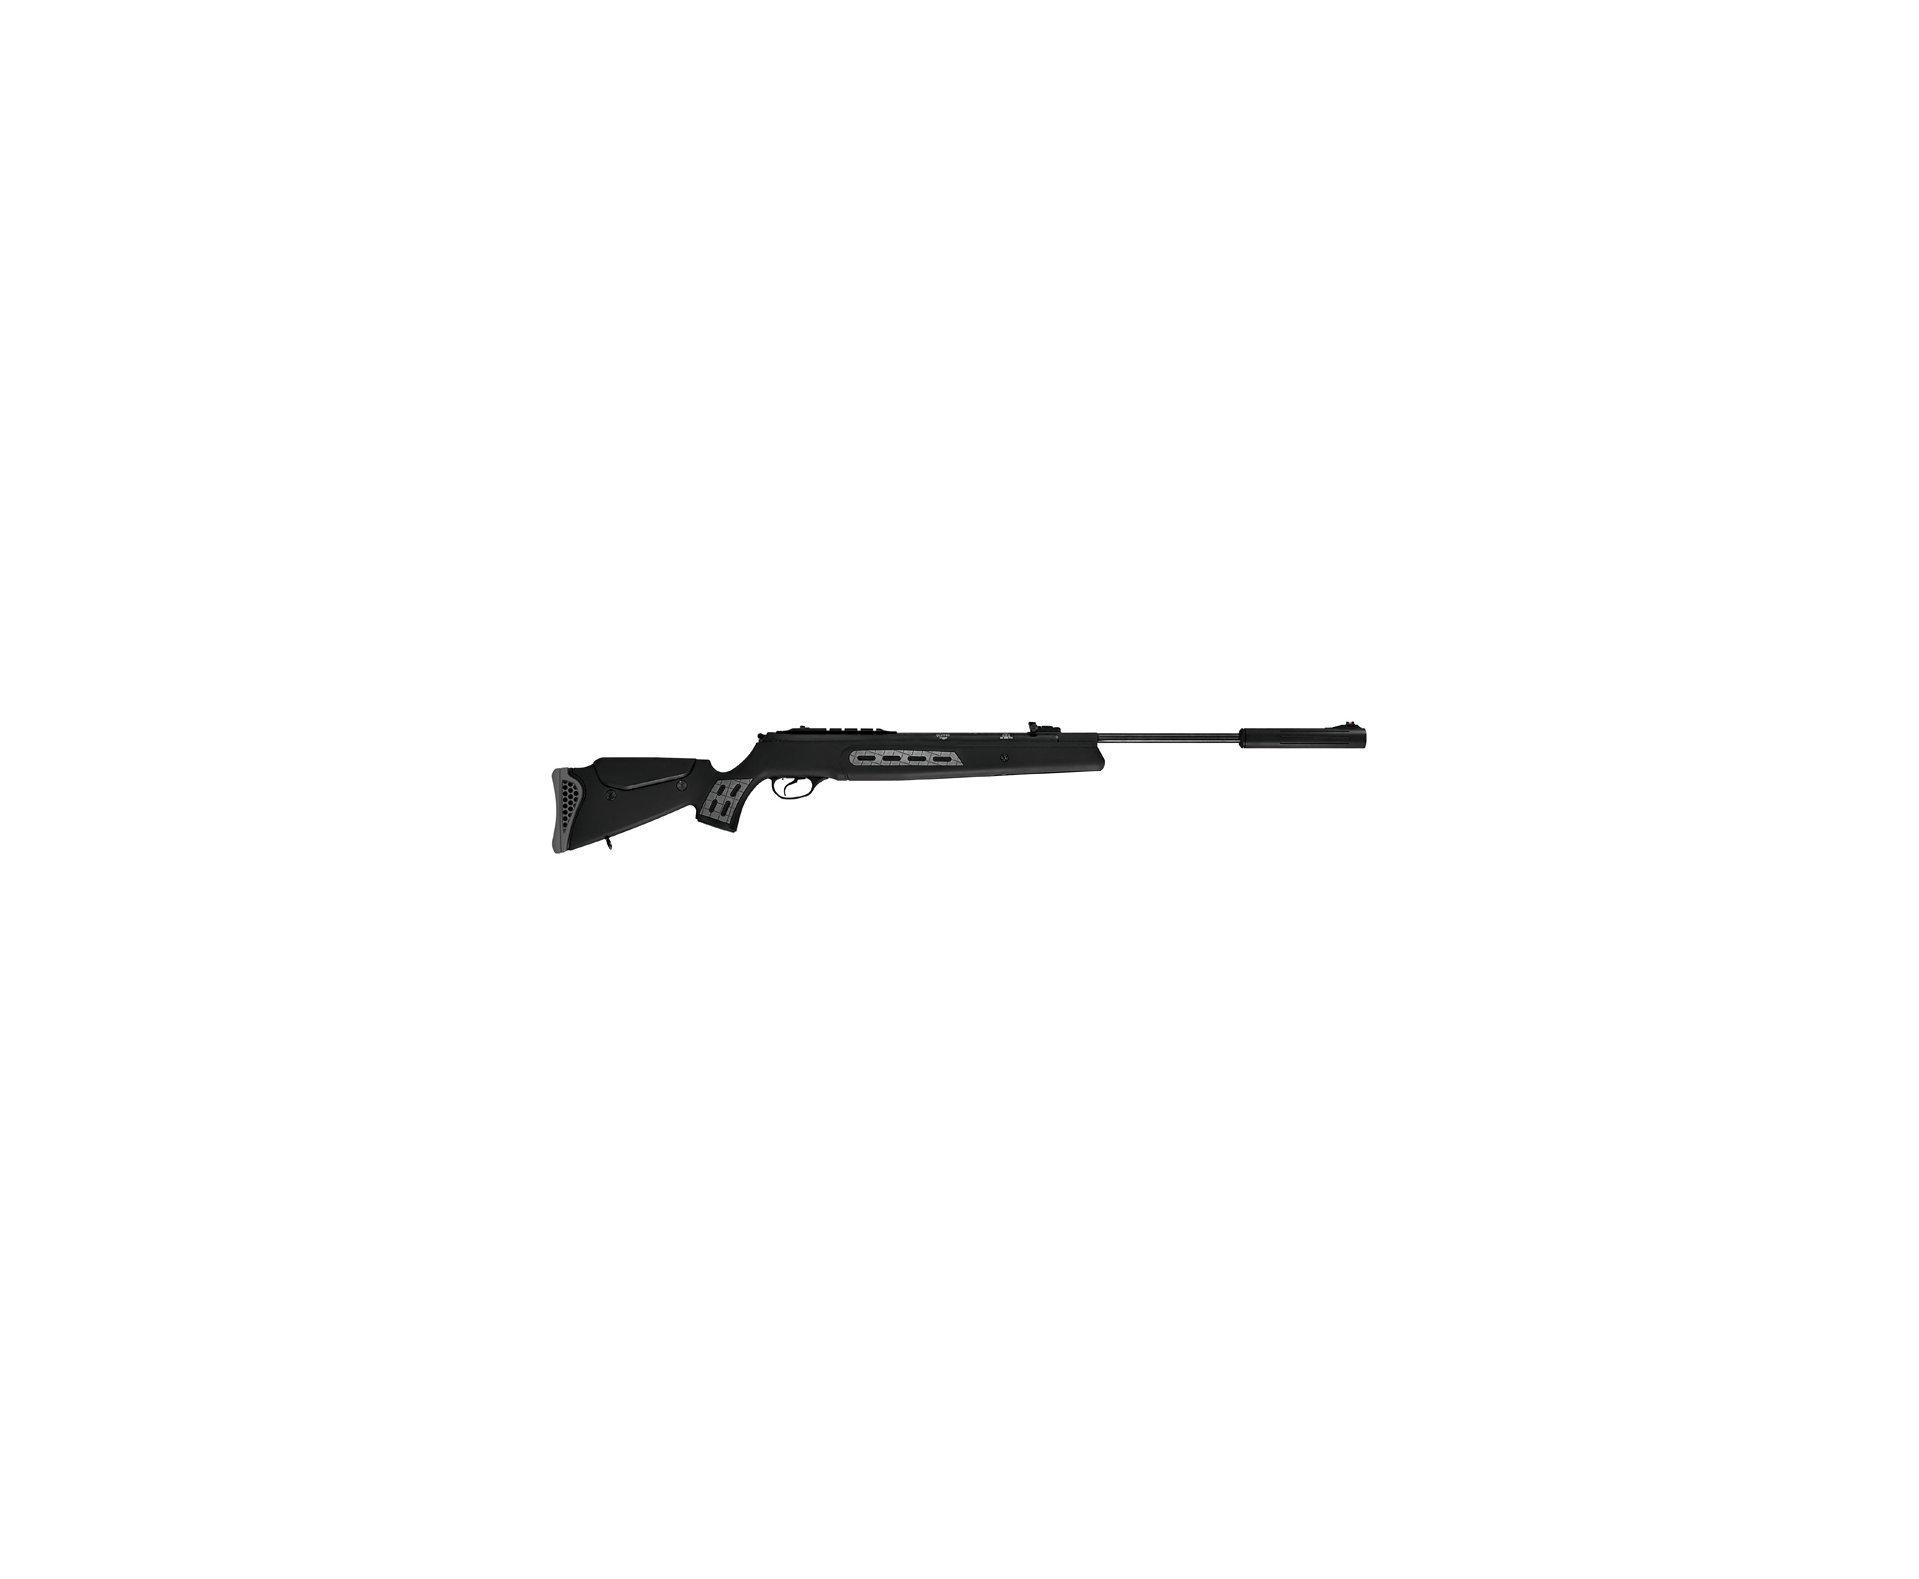 "Carabina De Pressão Hatsan Ht 125 Sniper - Cal 5,5 Mm - Sas + Capa 52"" + Chumbinhos"